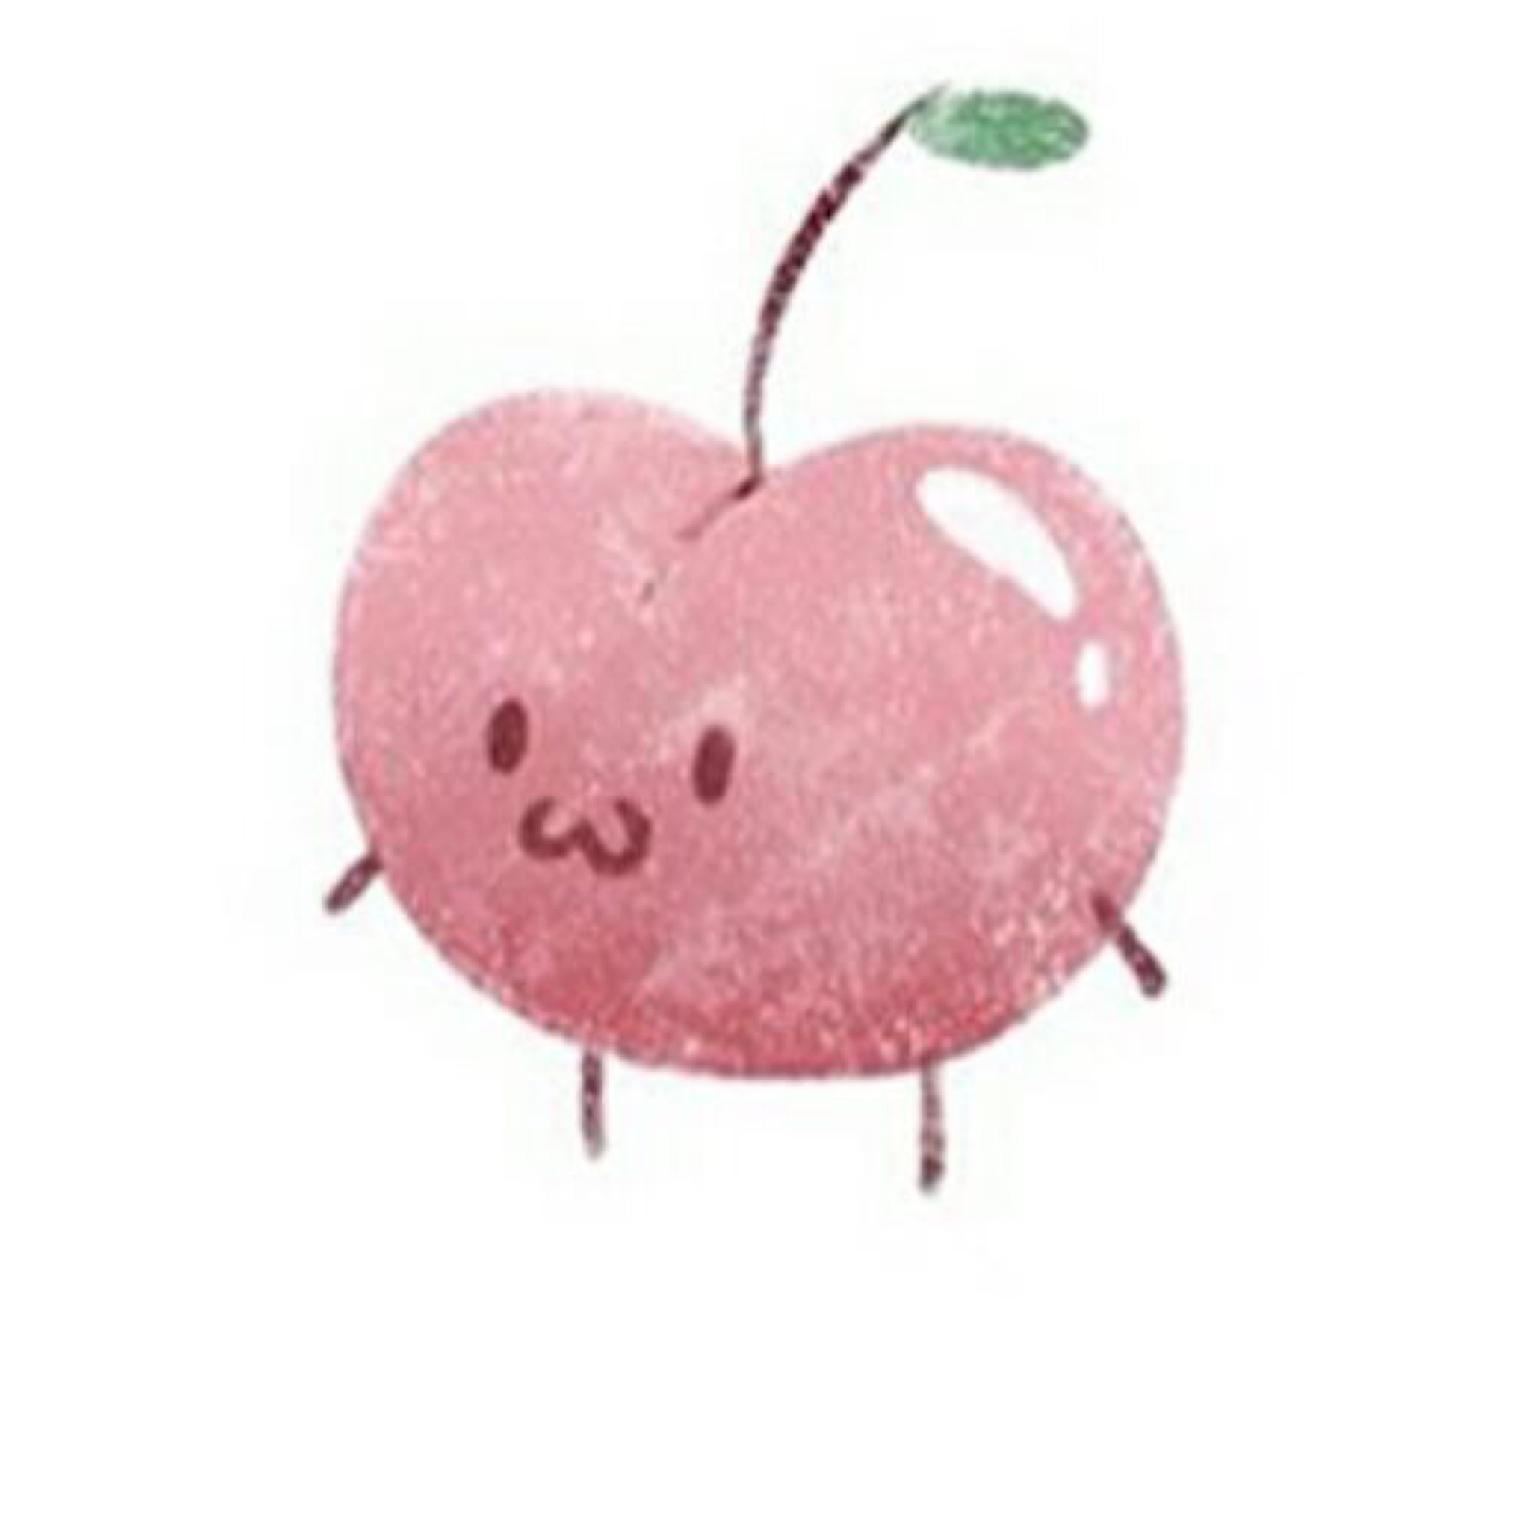 cranberryijeong